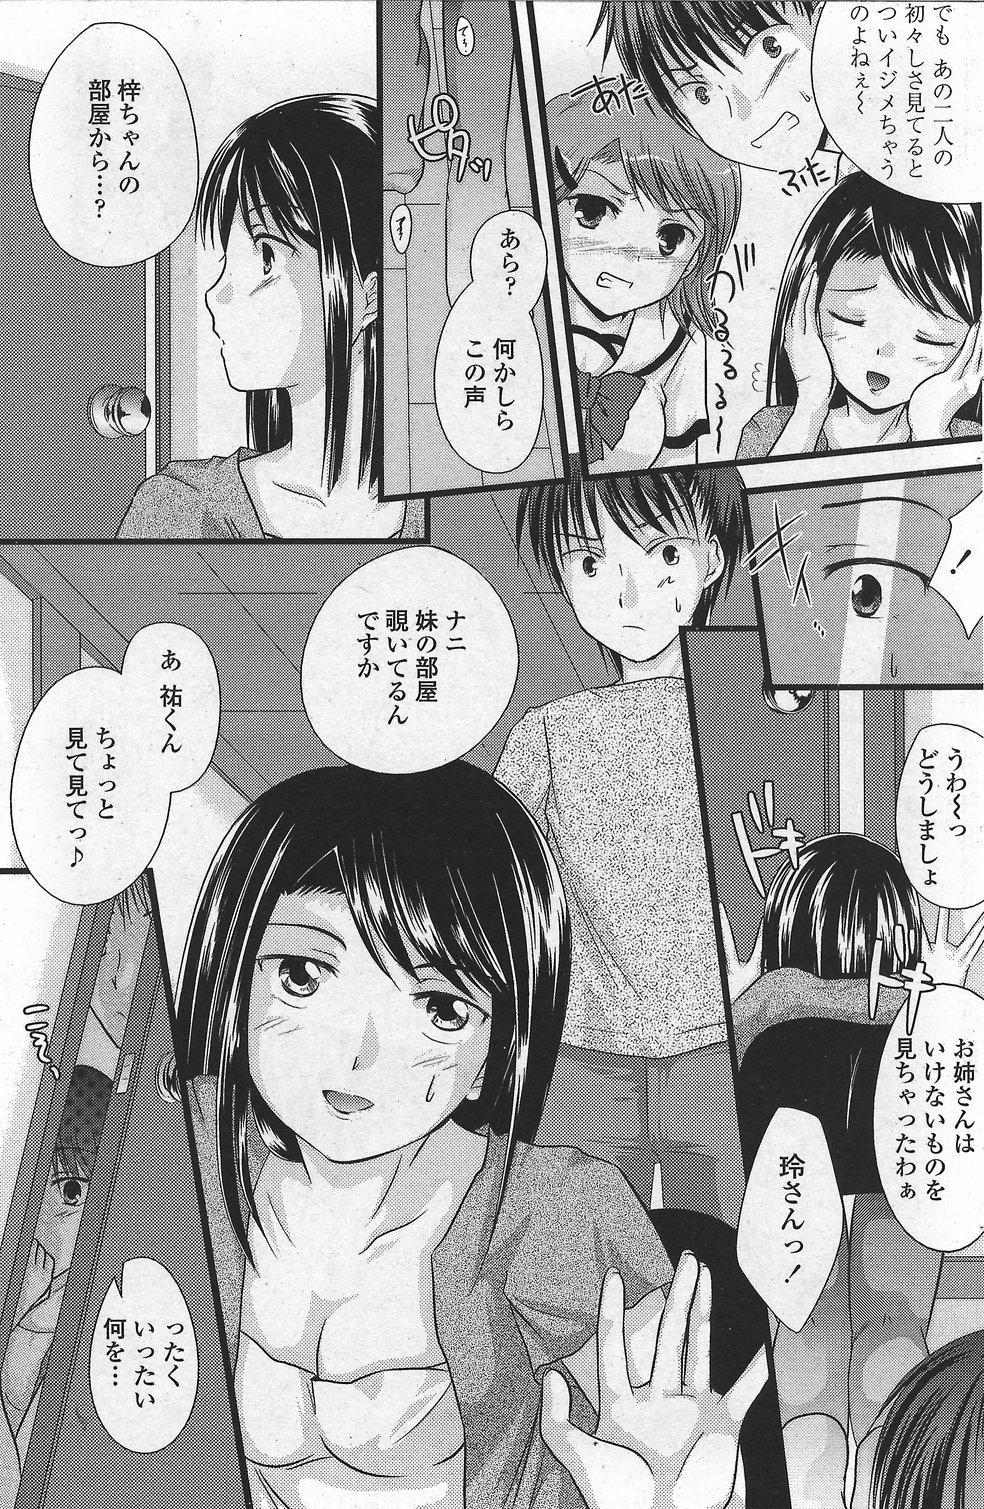 COMIC Penguin Club Sanzokuban 2007-10 Vol. 225 150